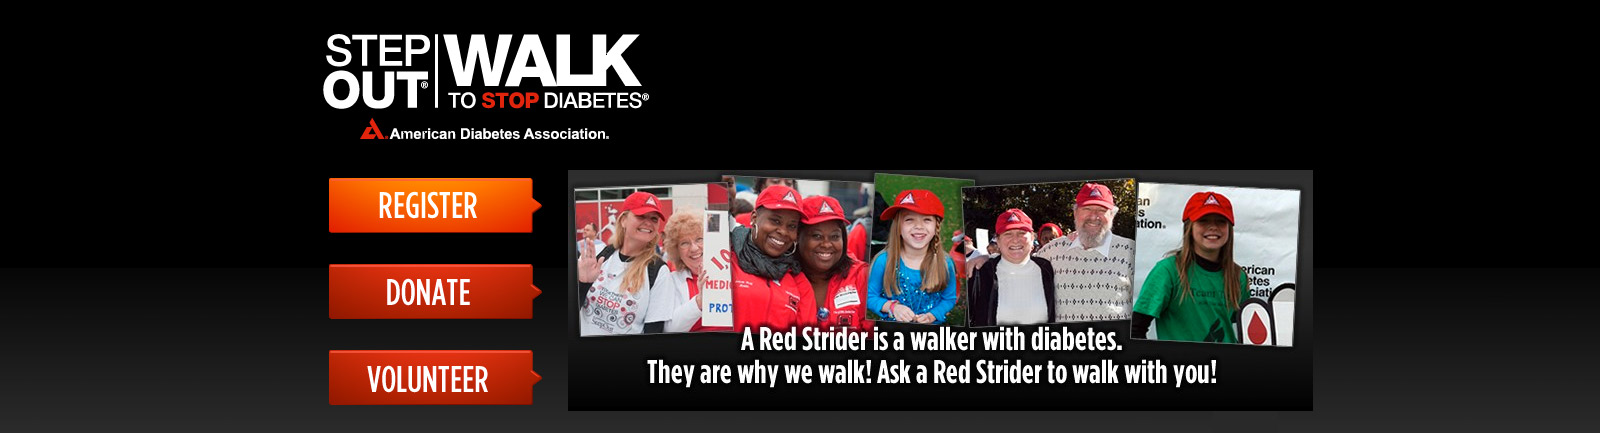 Diabetes - Step Out Walk